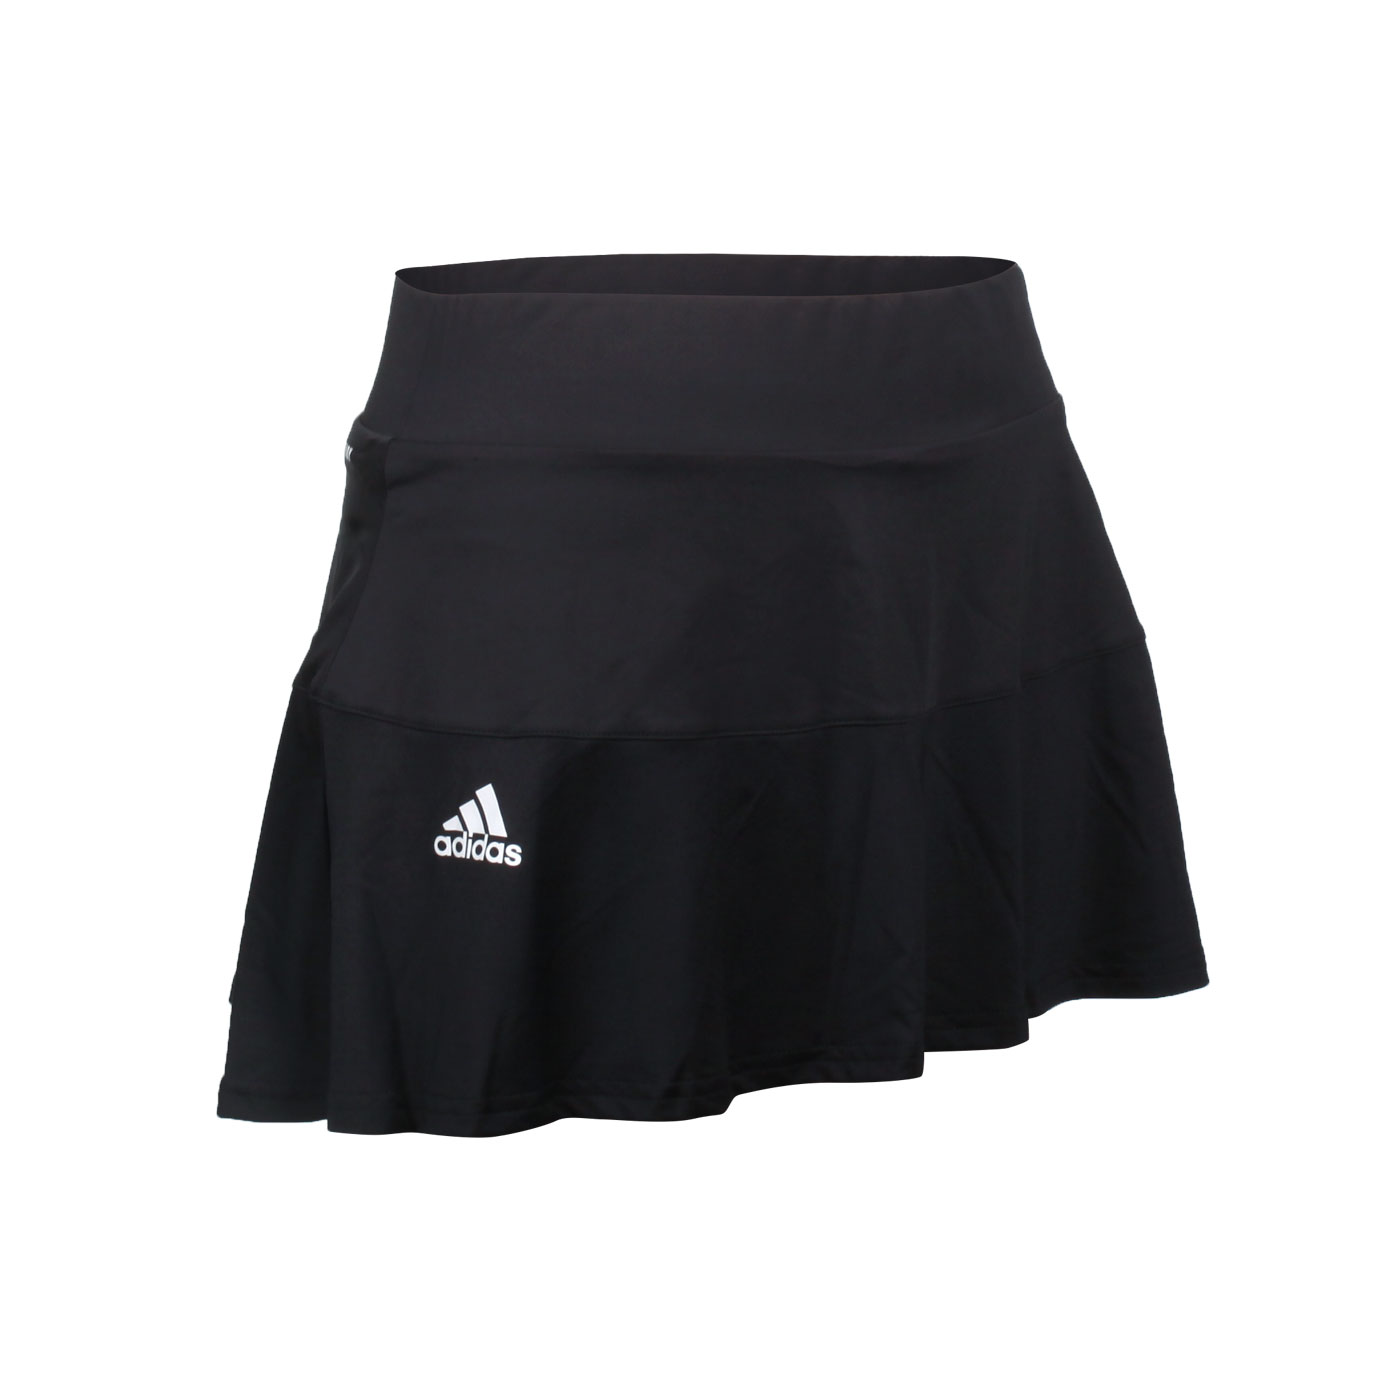 ADIDAS 女款運動短裙 GL6203